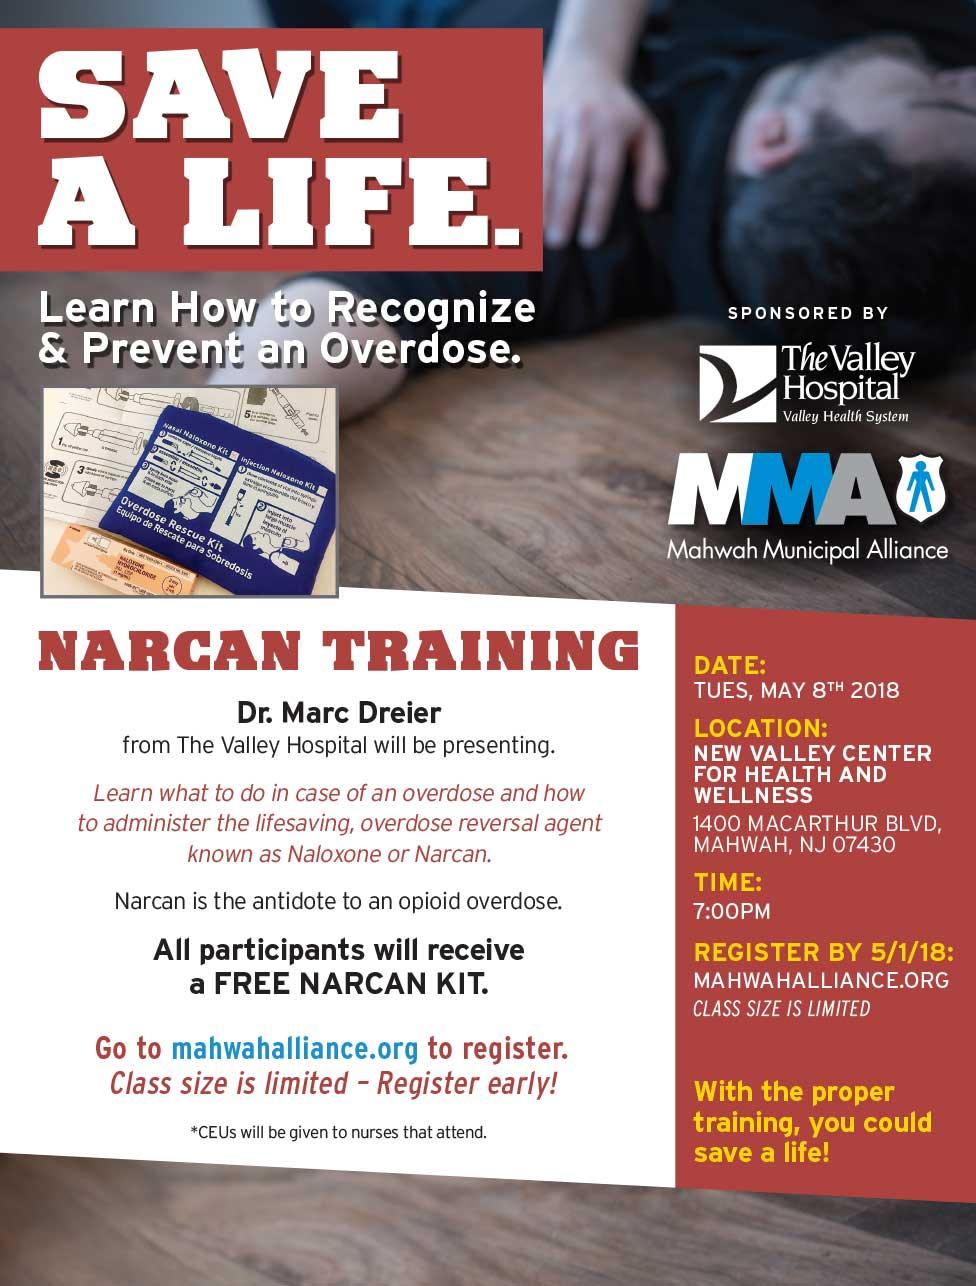 MMA-Narcan-Training-3-18.jpg